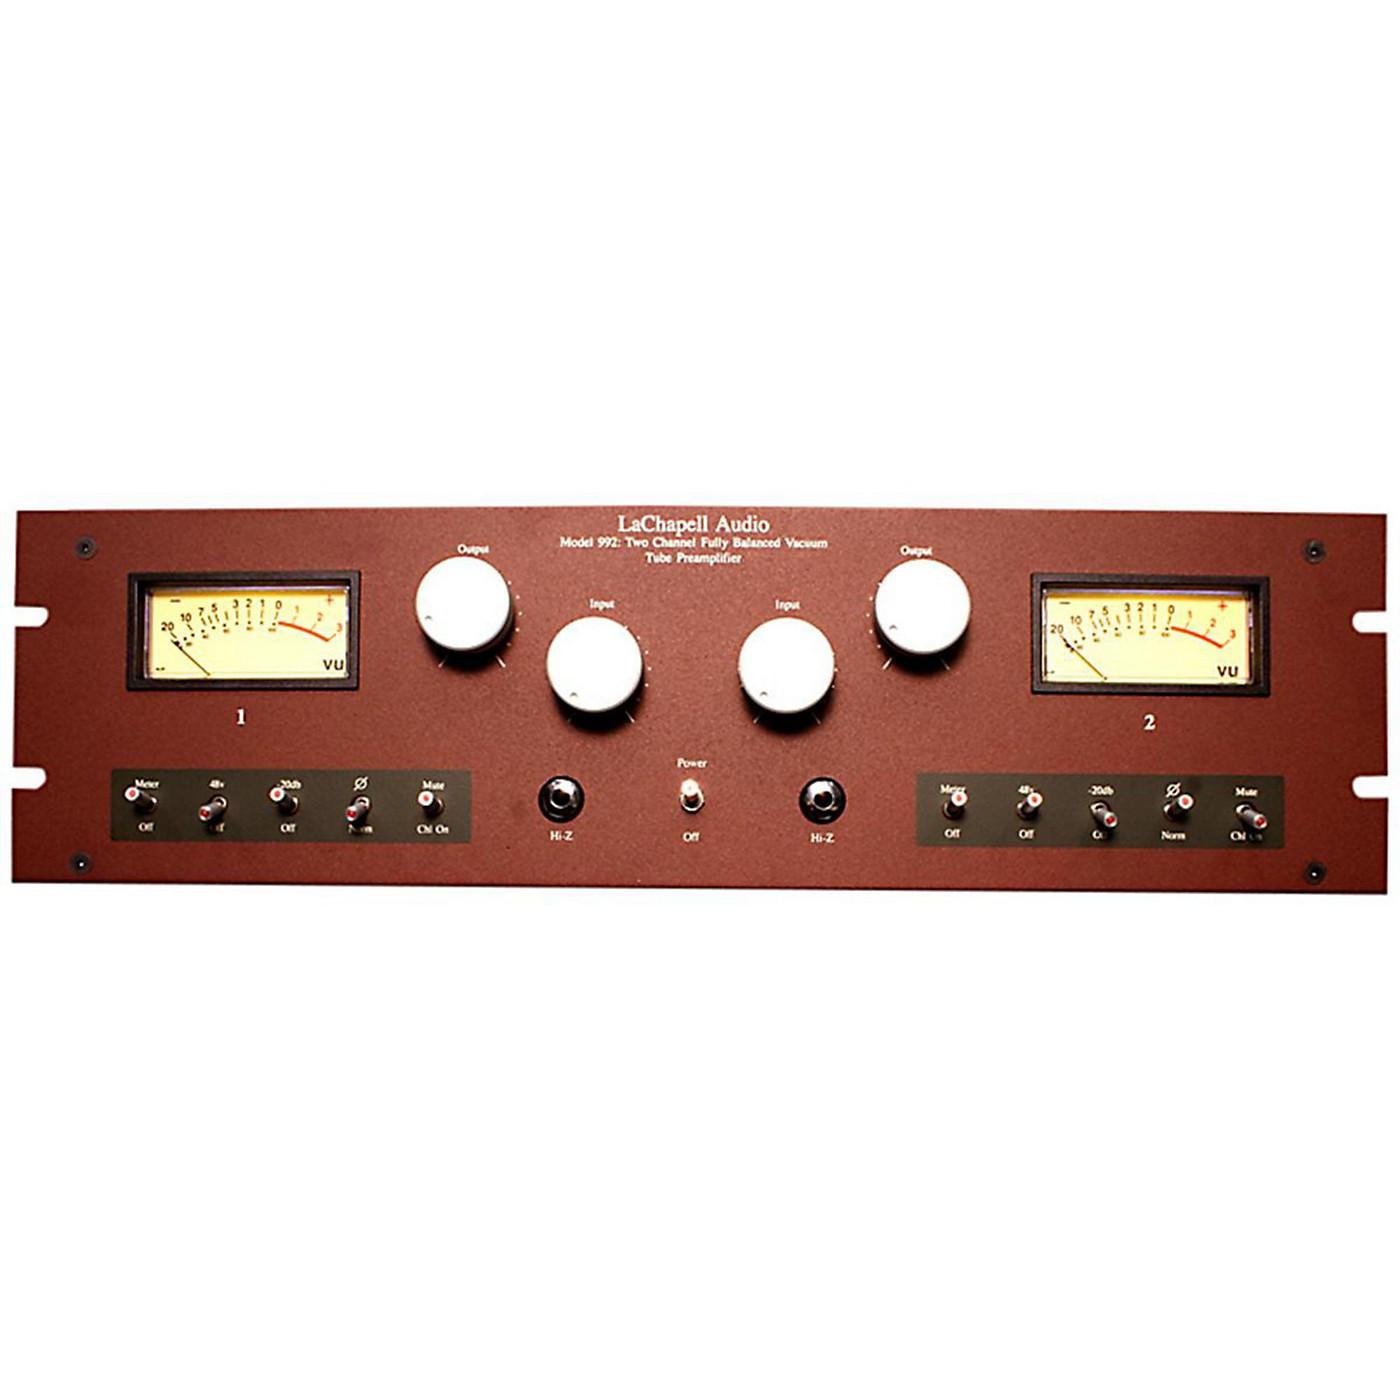 LaChapell Audio 992EG 2-Channel Extended Gain Tube Mic Pre thumbnail